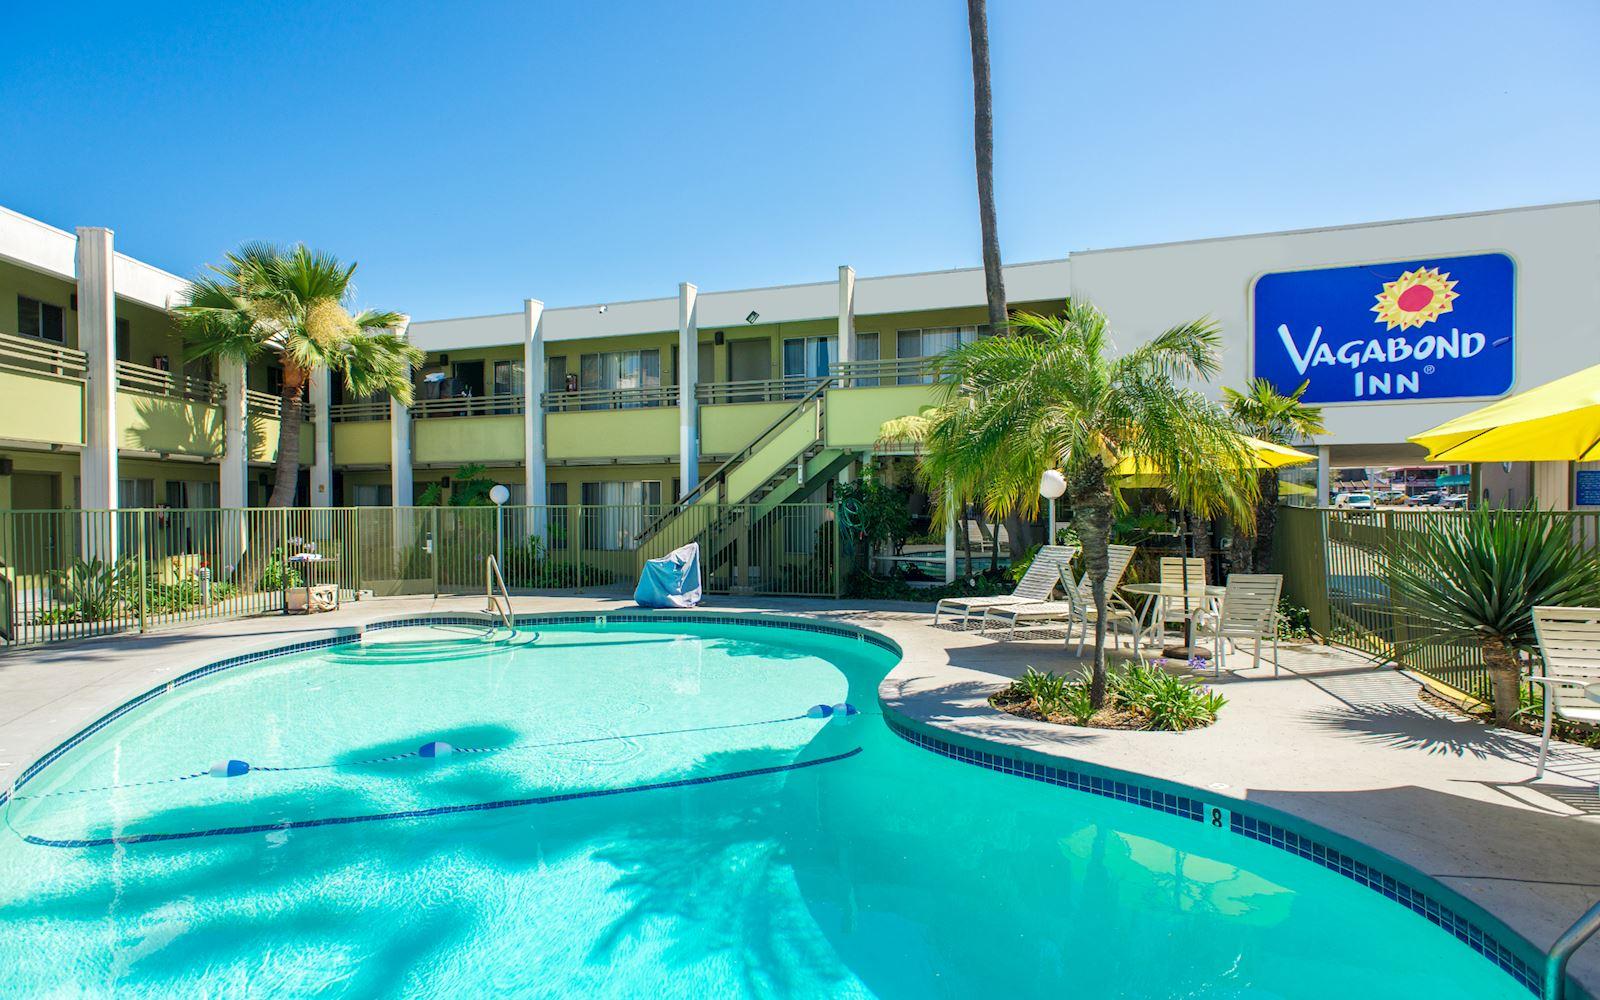 Hotels In San Diego >> San Diego Airport Hotel Directions Vagabond Inn